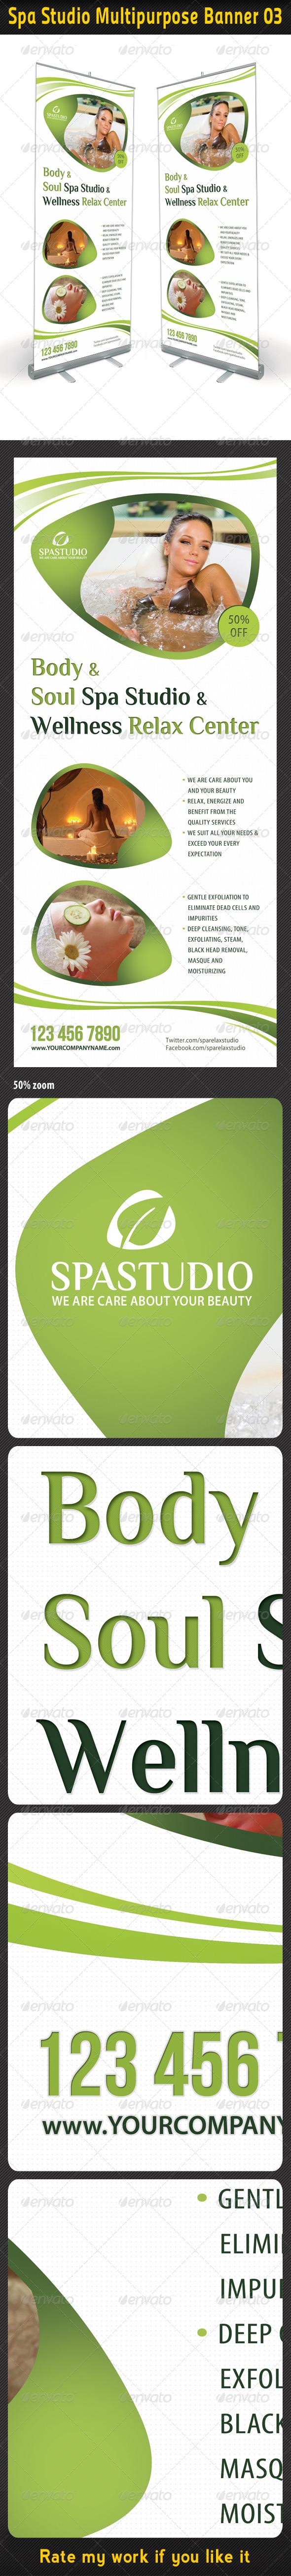 Spa Studio Multipurpose Banner 03 - Signage Print Templates